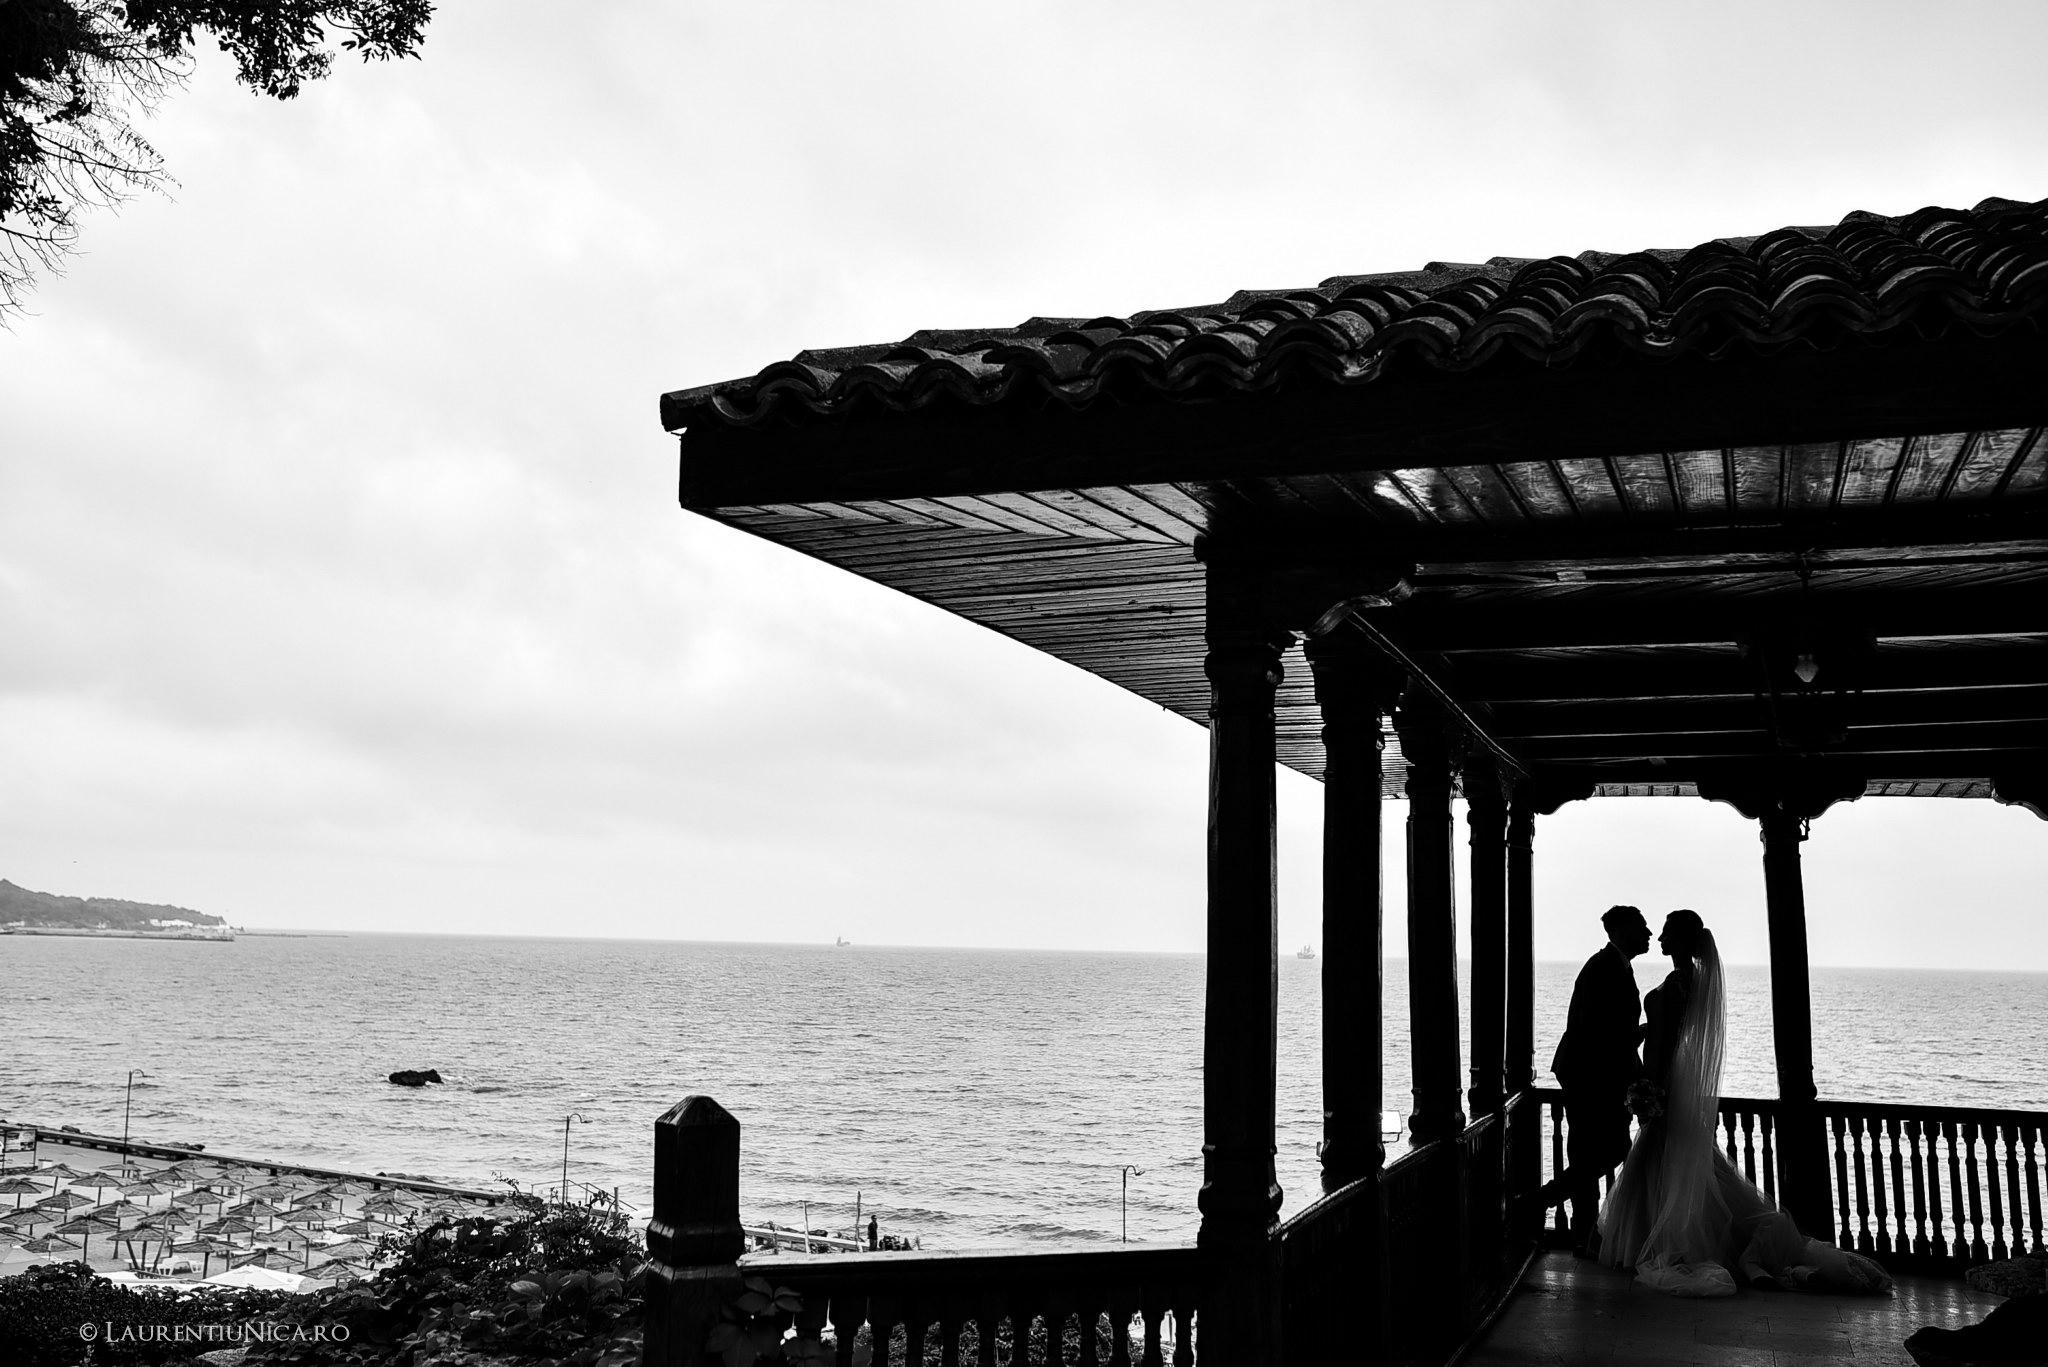 andreea si alin fotografii after wedding balchik bulgaria30 - Andreea & Alin | Fotografii After Wedding | Balchik Bulgaria